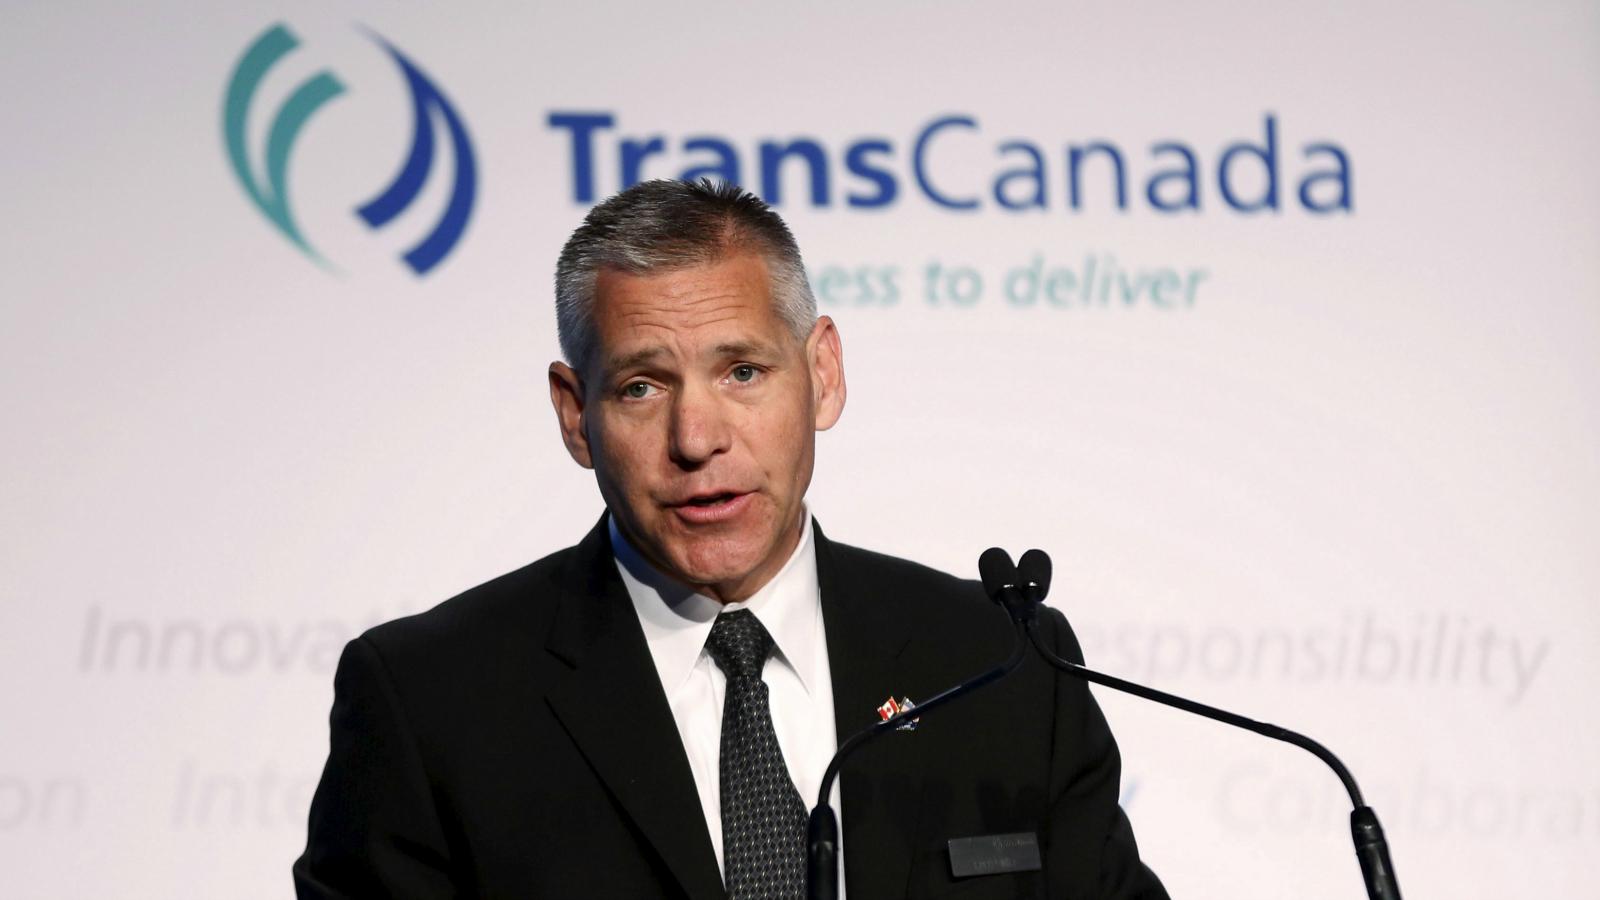 TransCanada CEO Russ Girling